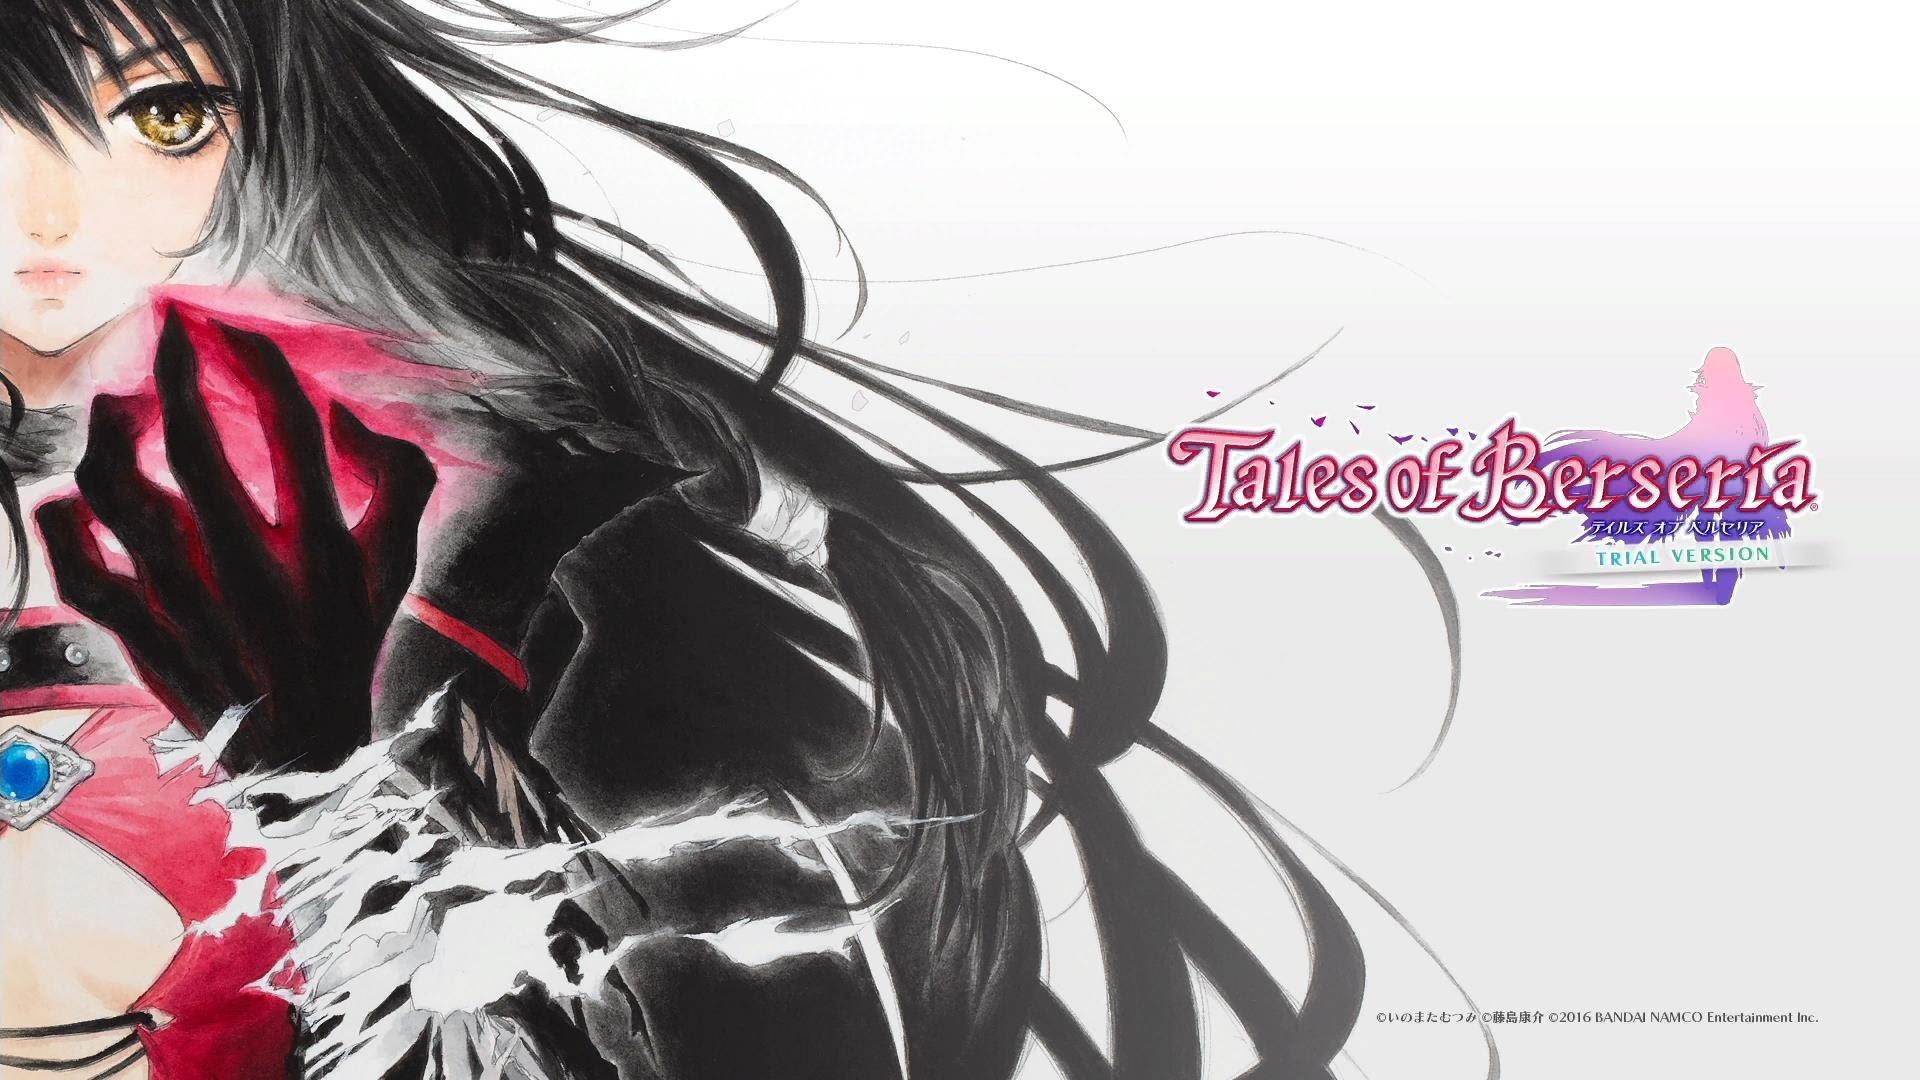 Wallpaper Tales Of Berseria Playstation 4 Tales Of Series